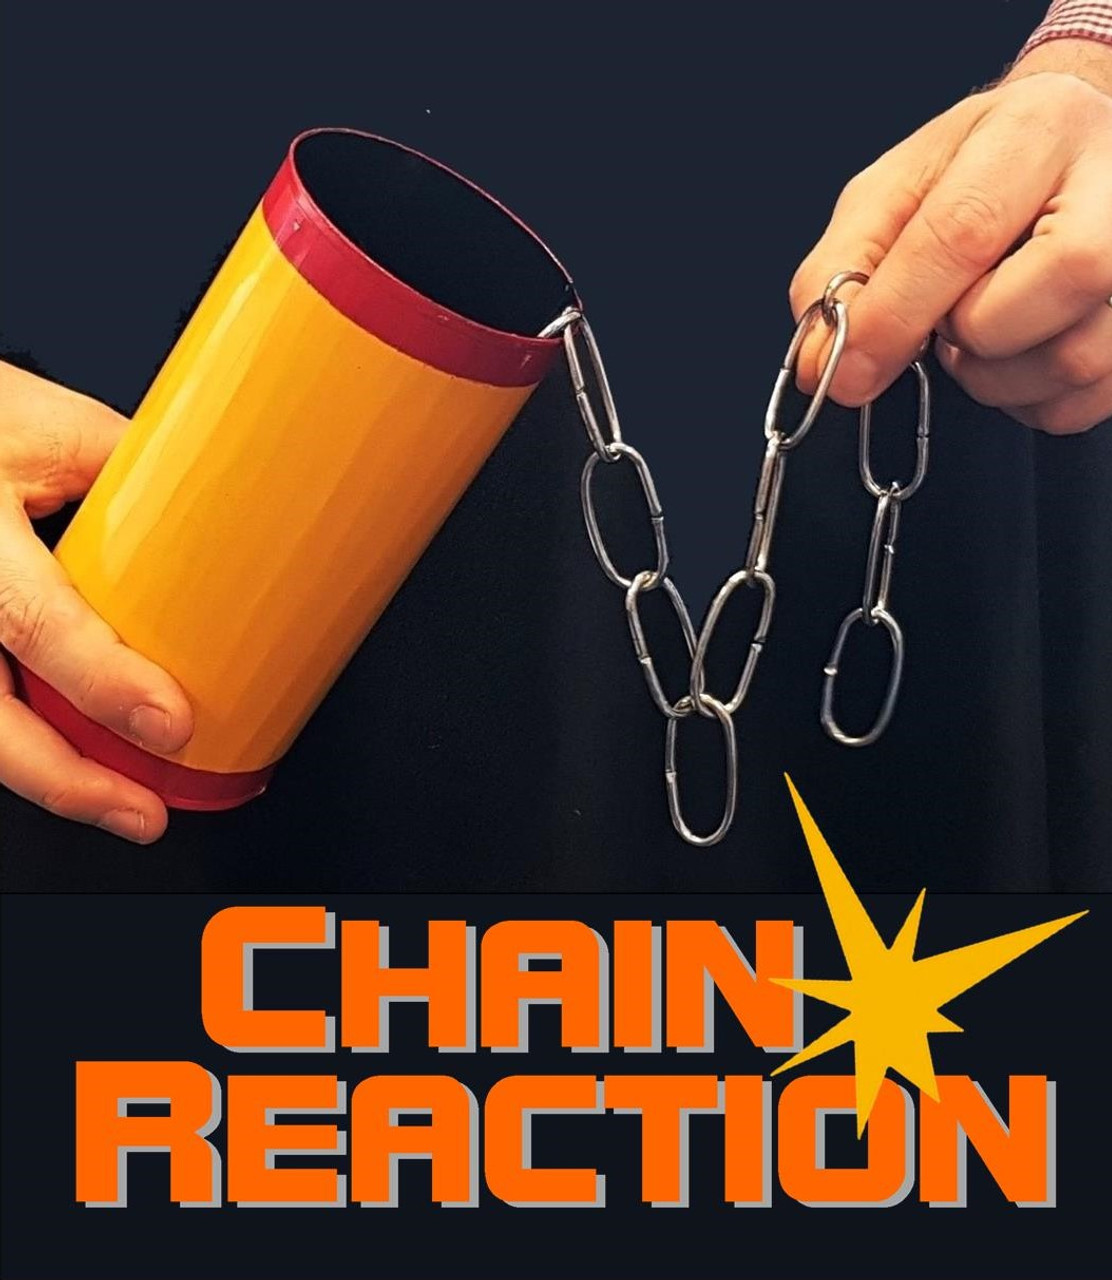 Chain Reaction Deluxe Welded Chain Effect Trick Gospel